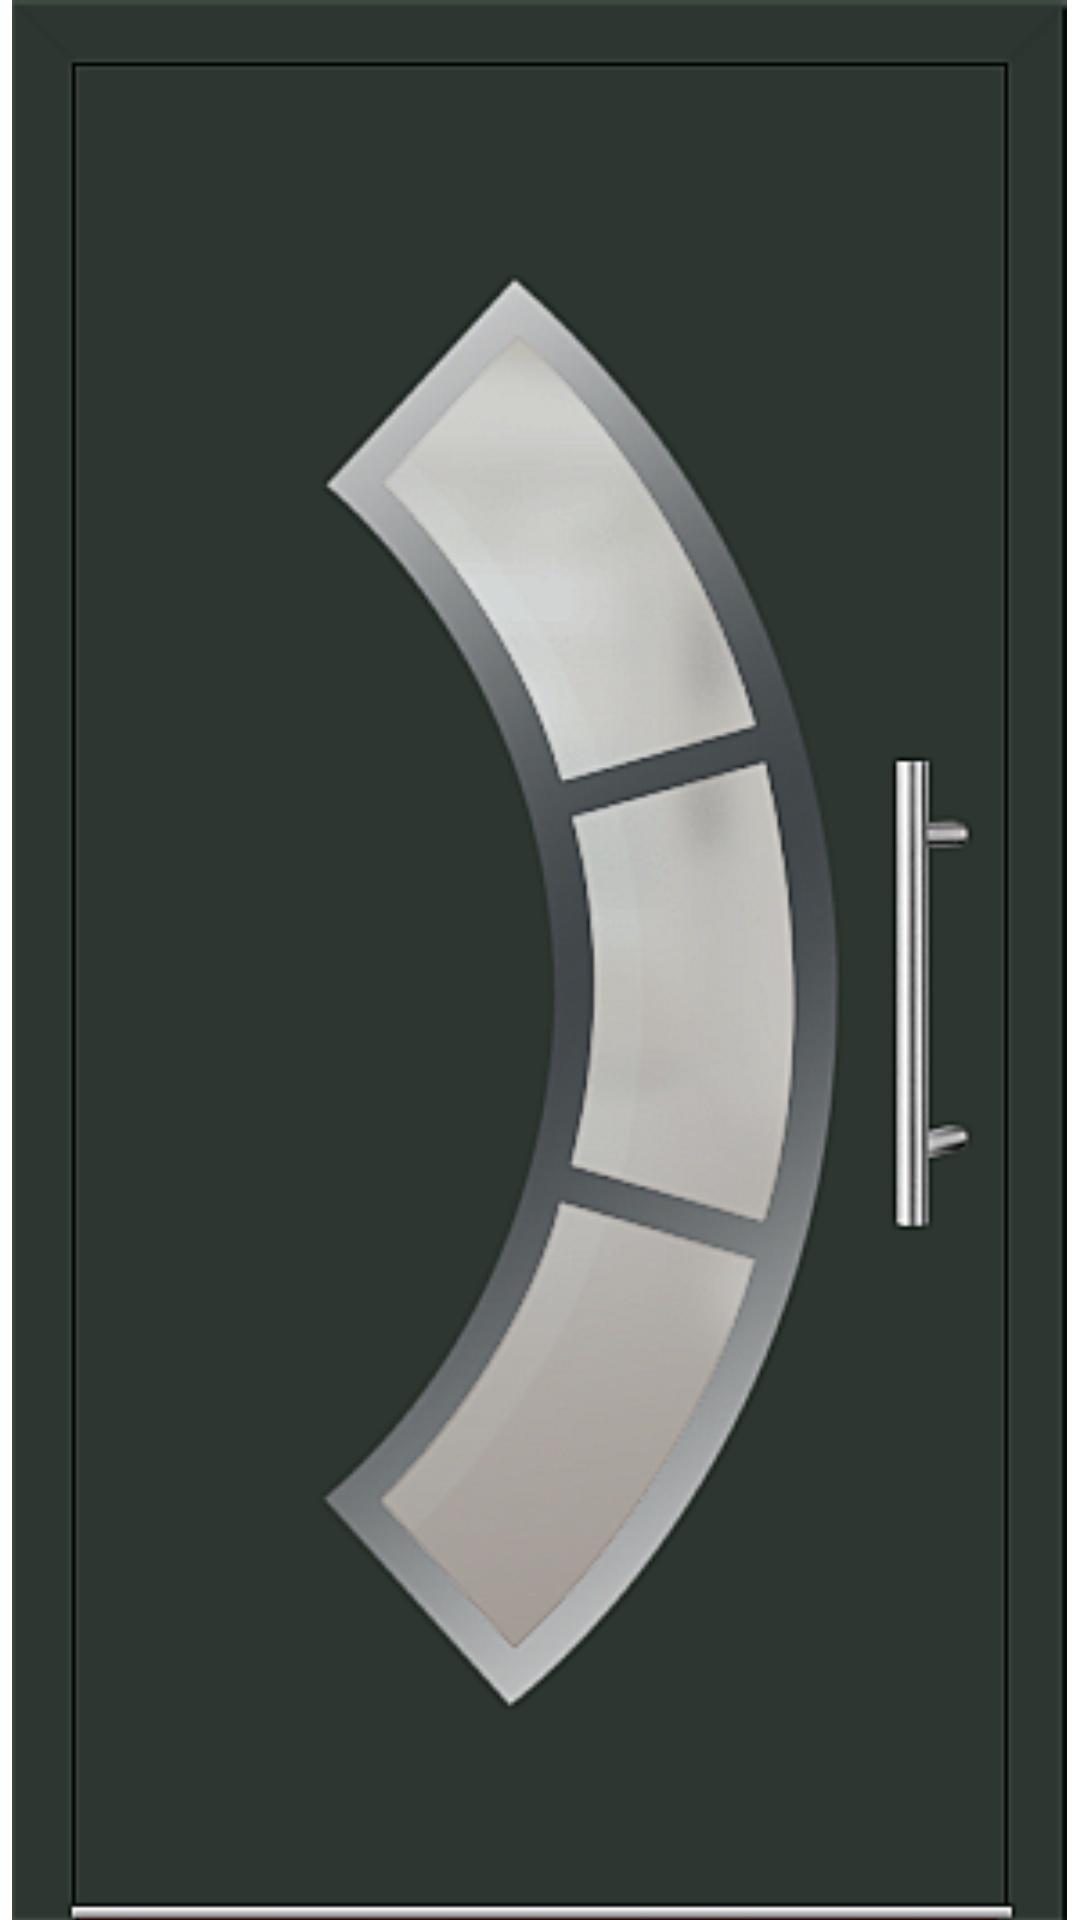 Aluminium Haustür Modell 6440-75 tannengrün